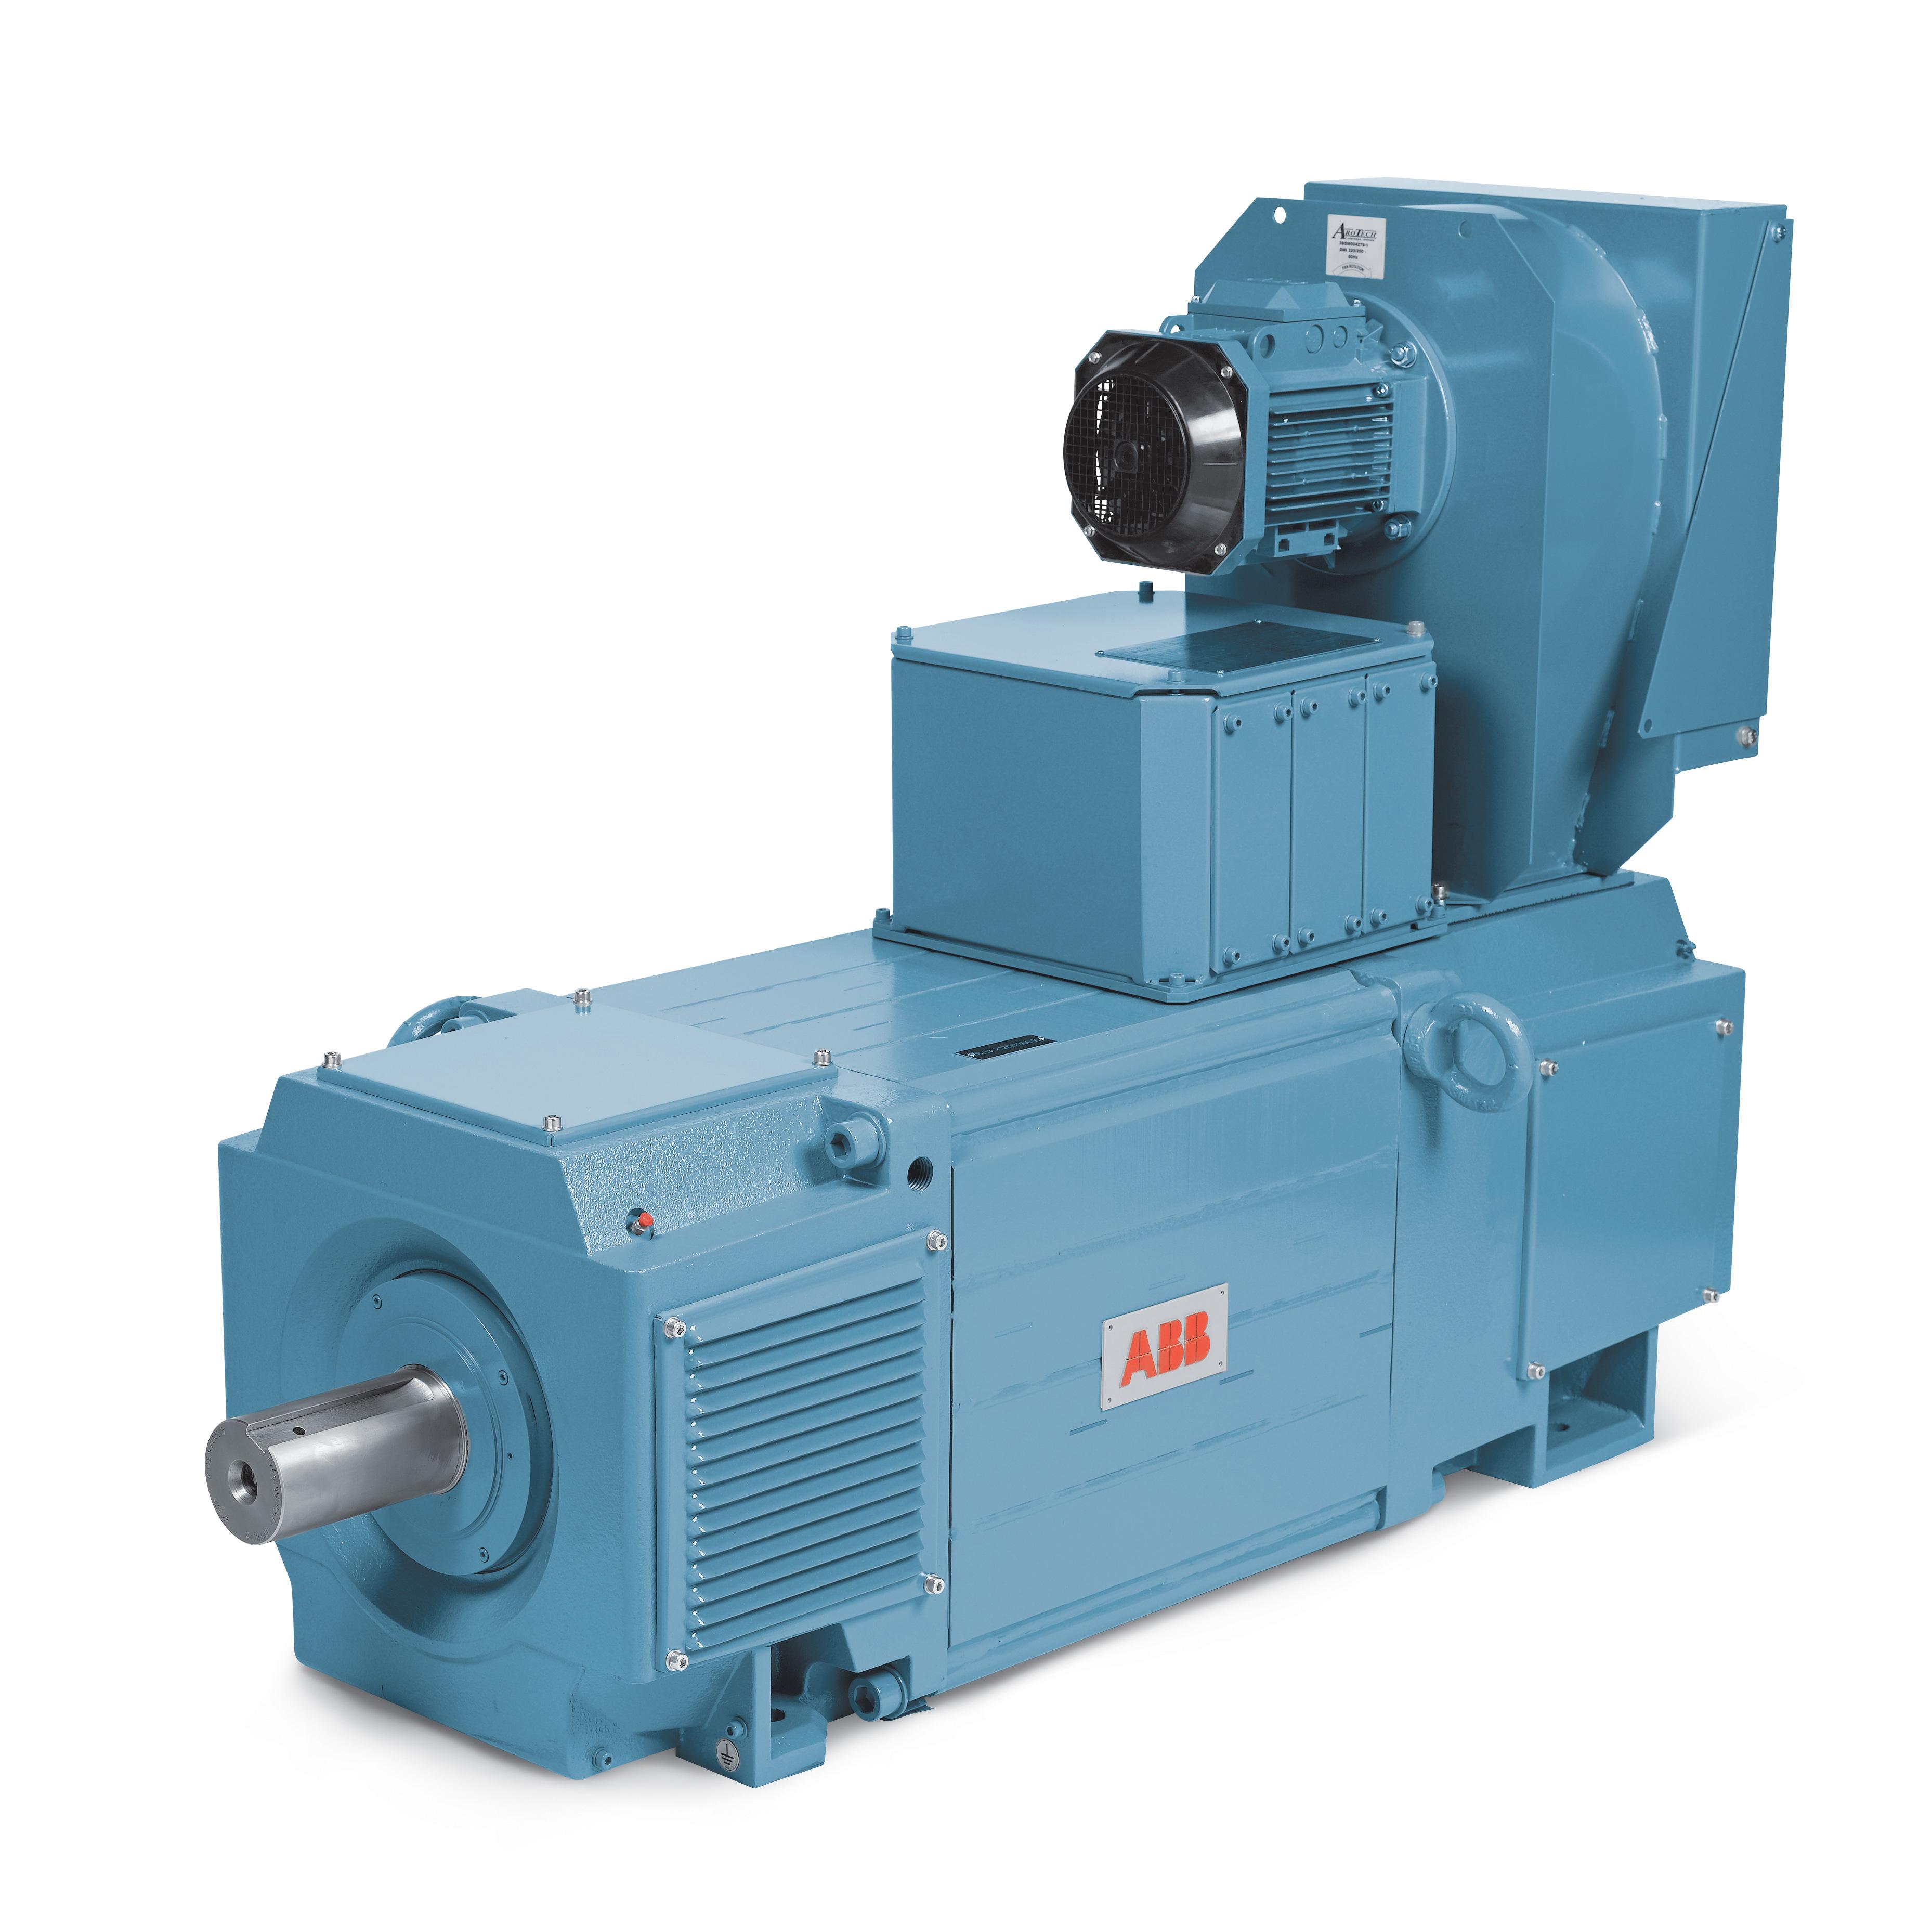 ABB DC Motor wiring diagram manual transfer switch 17 on wiring diagram manual transfer switch